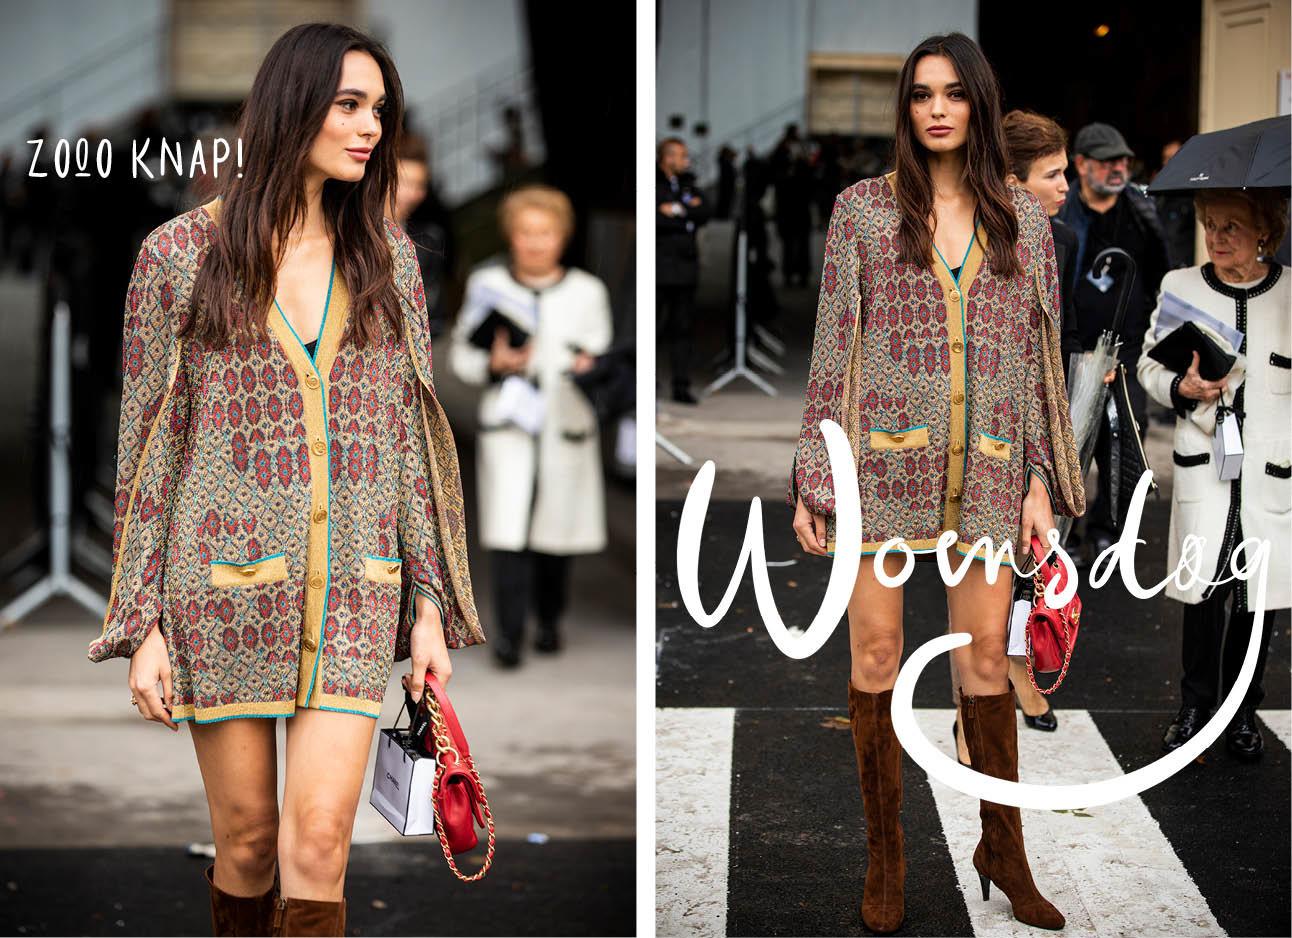 Solange Smith fashion model trui blote benen hoge laarzen